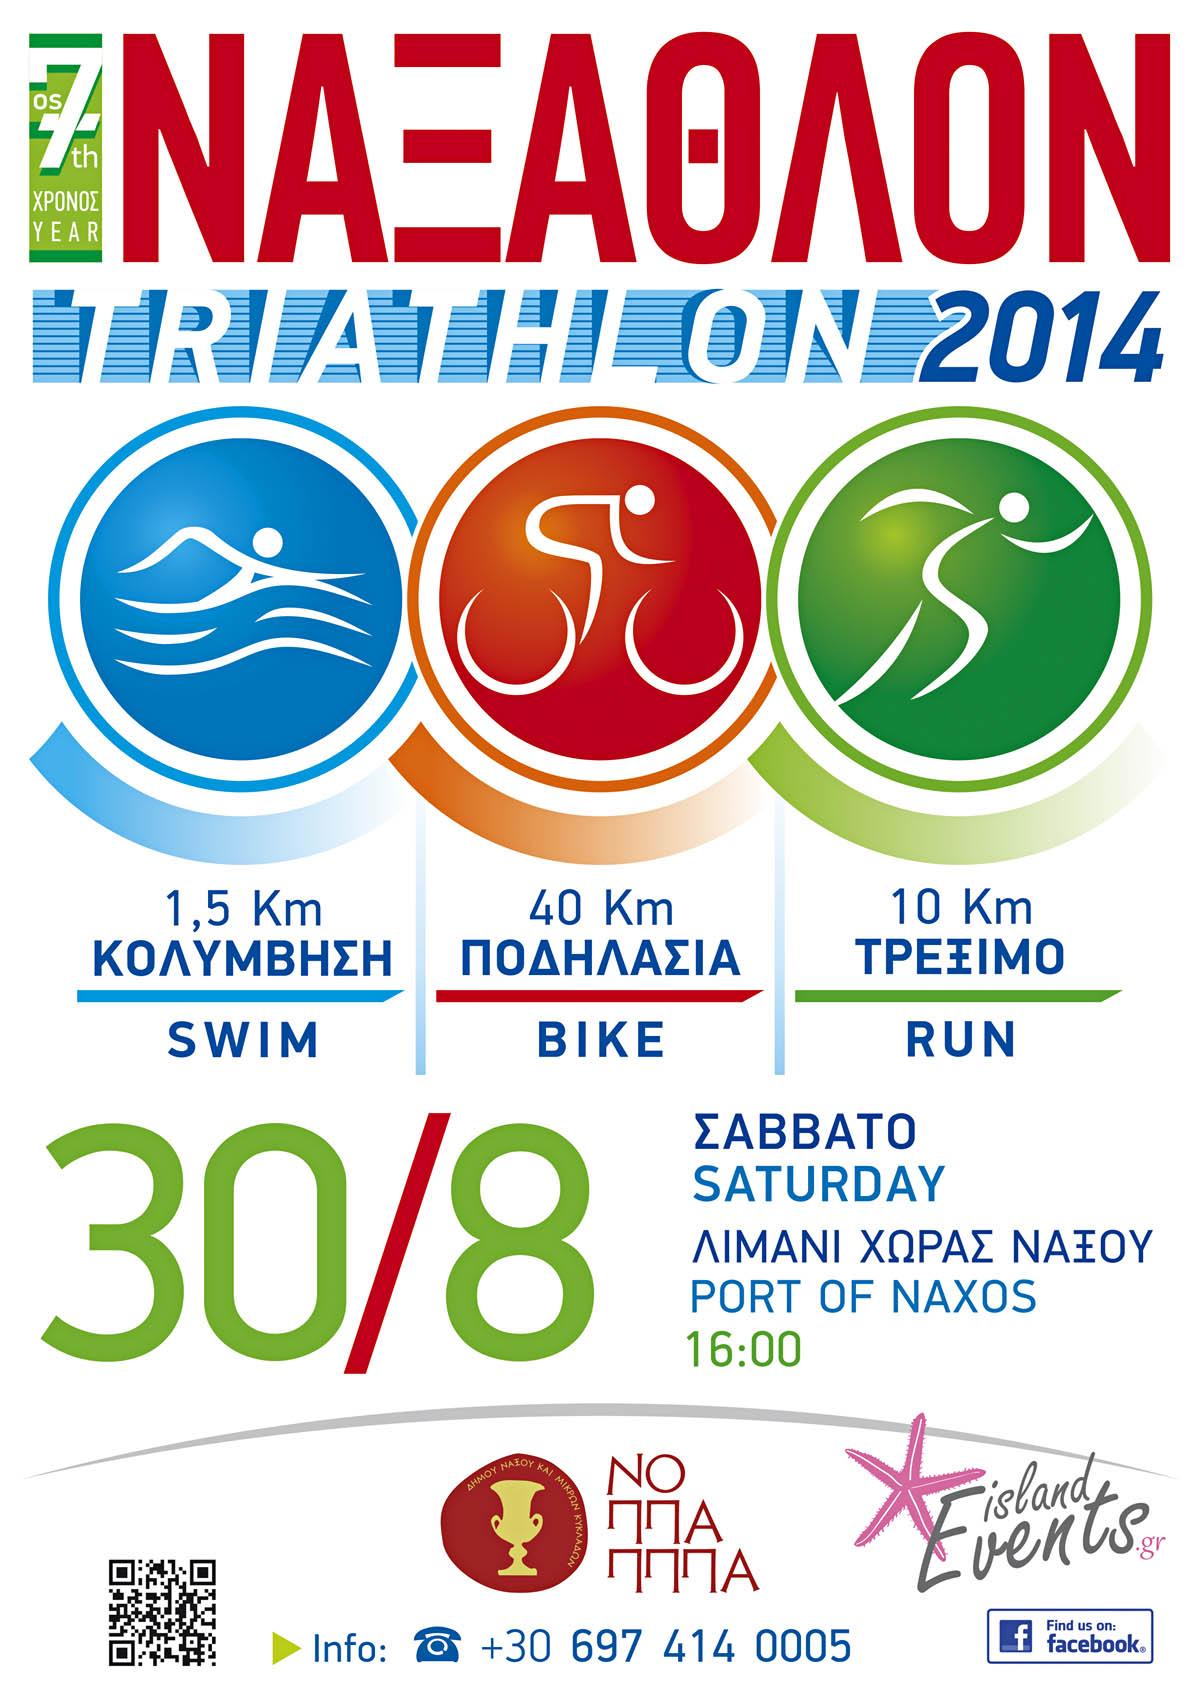 Triathlon Poster 2014